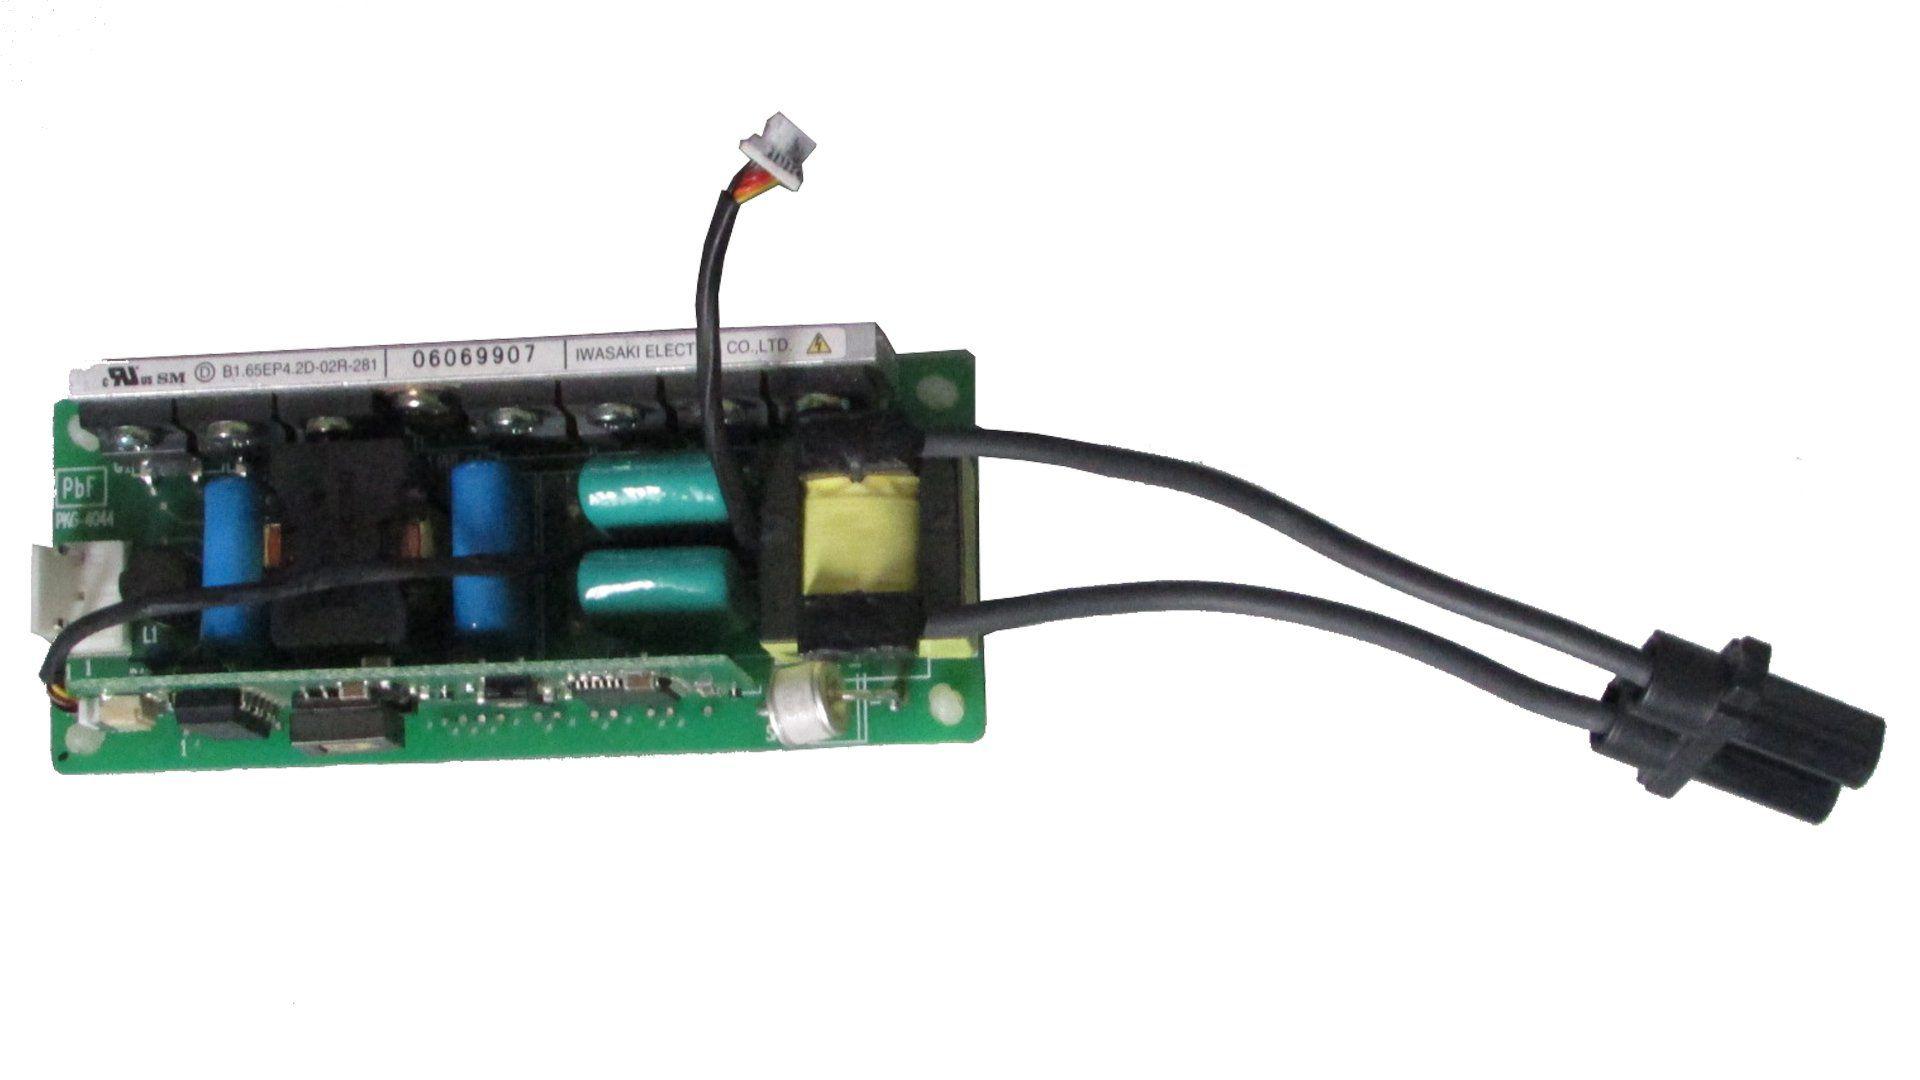 Placa Inverter P/ Projetor Sony Vpl-es3 PN: Pkg-4044 - Retirado